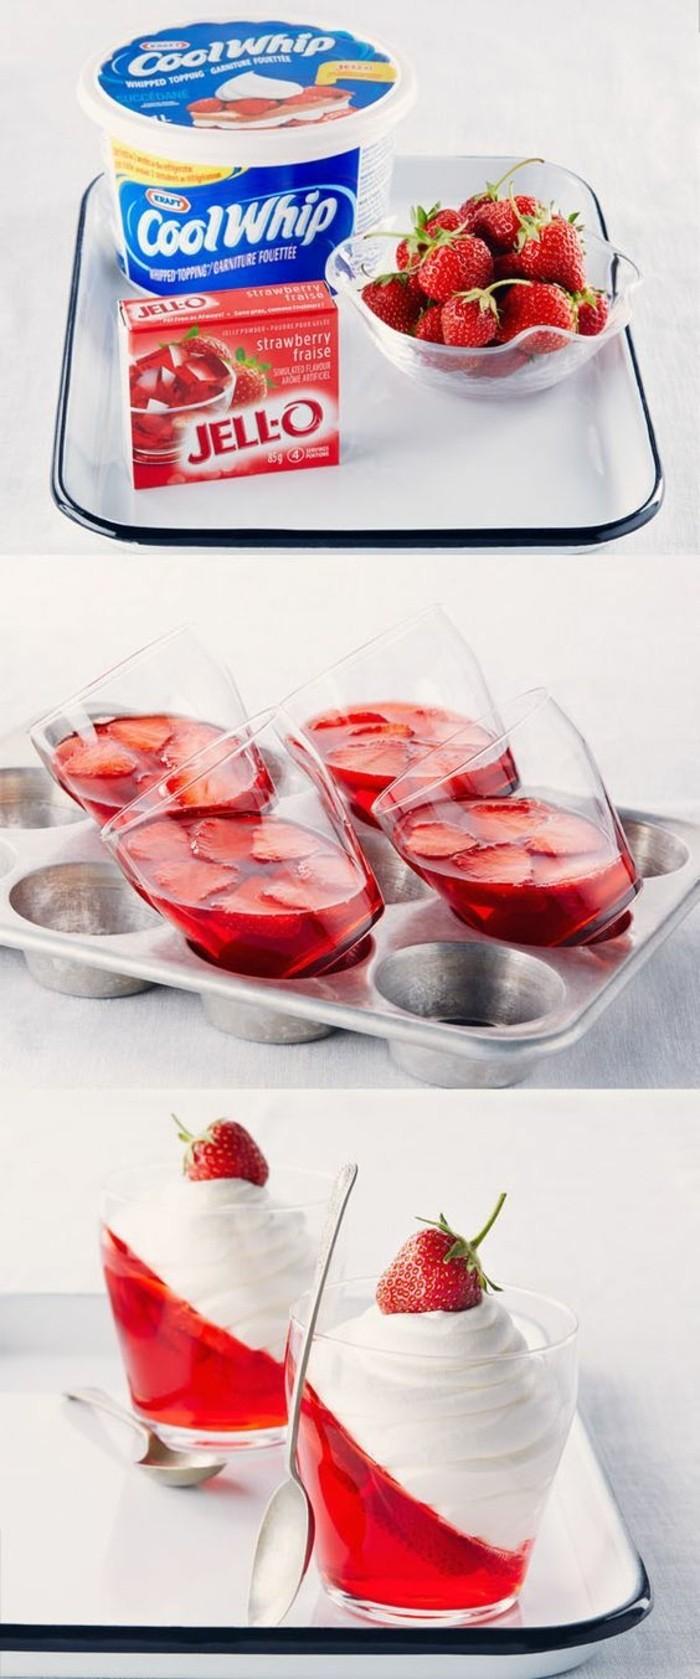 verrine-sucree-idee-dessert-original-dessert-en-verrine